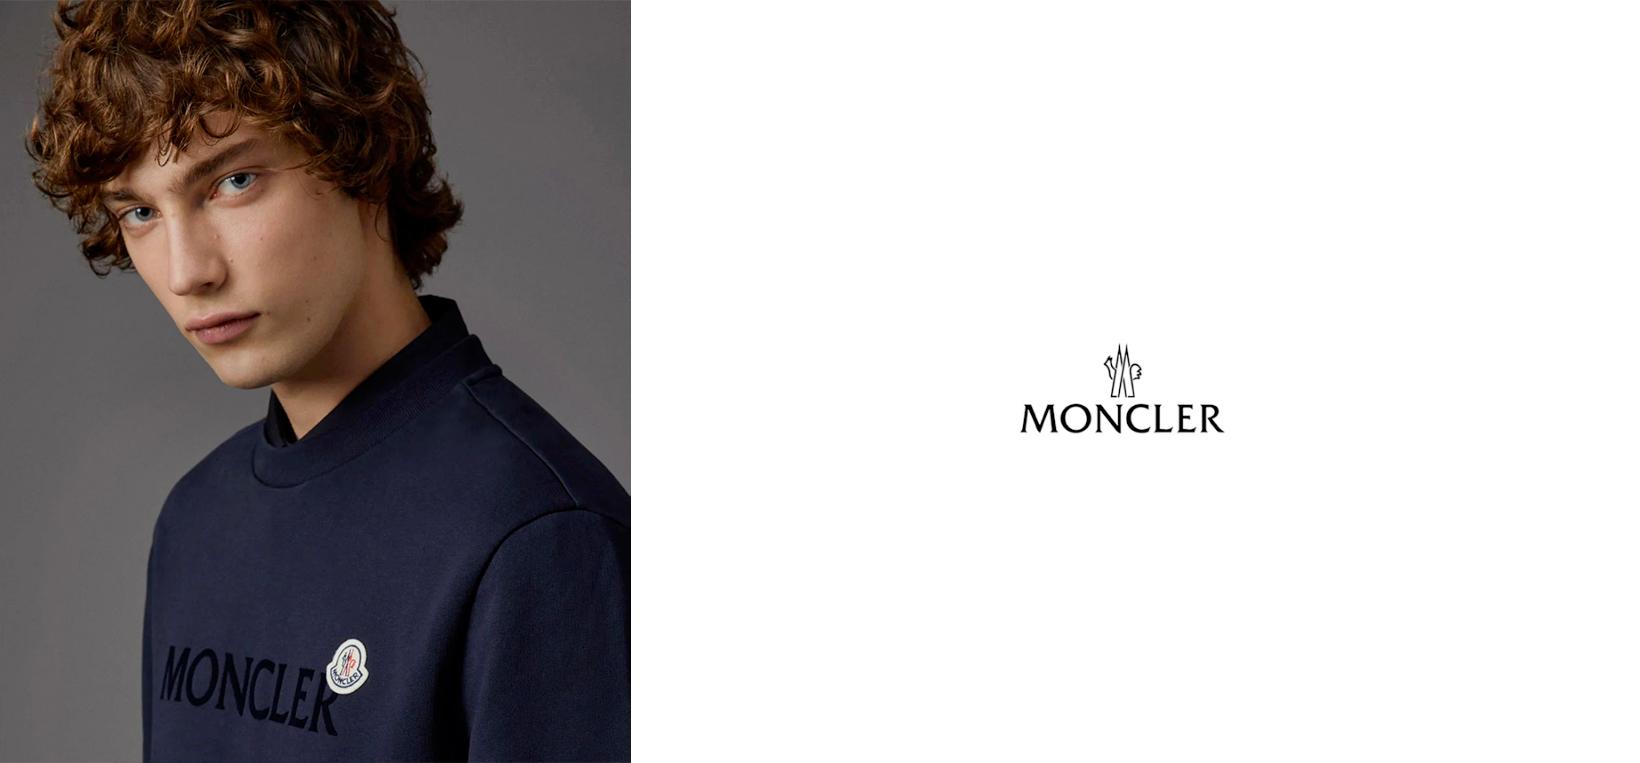 MONCLER - Uomo - Scarpe - Leam Roma